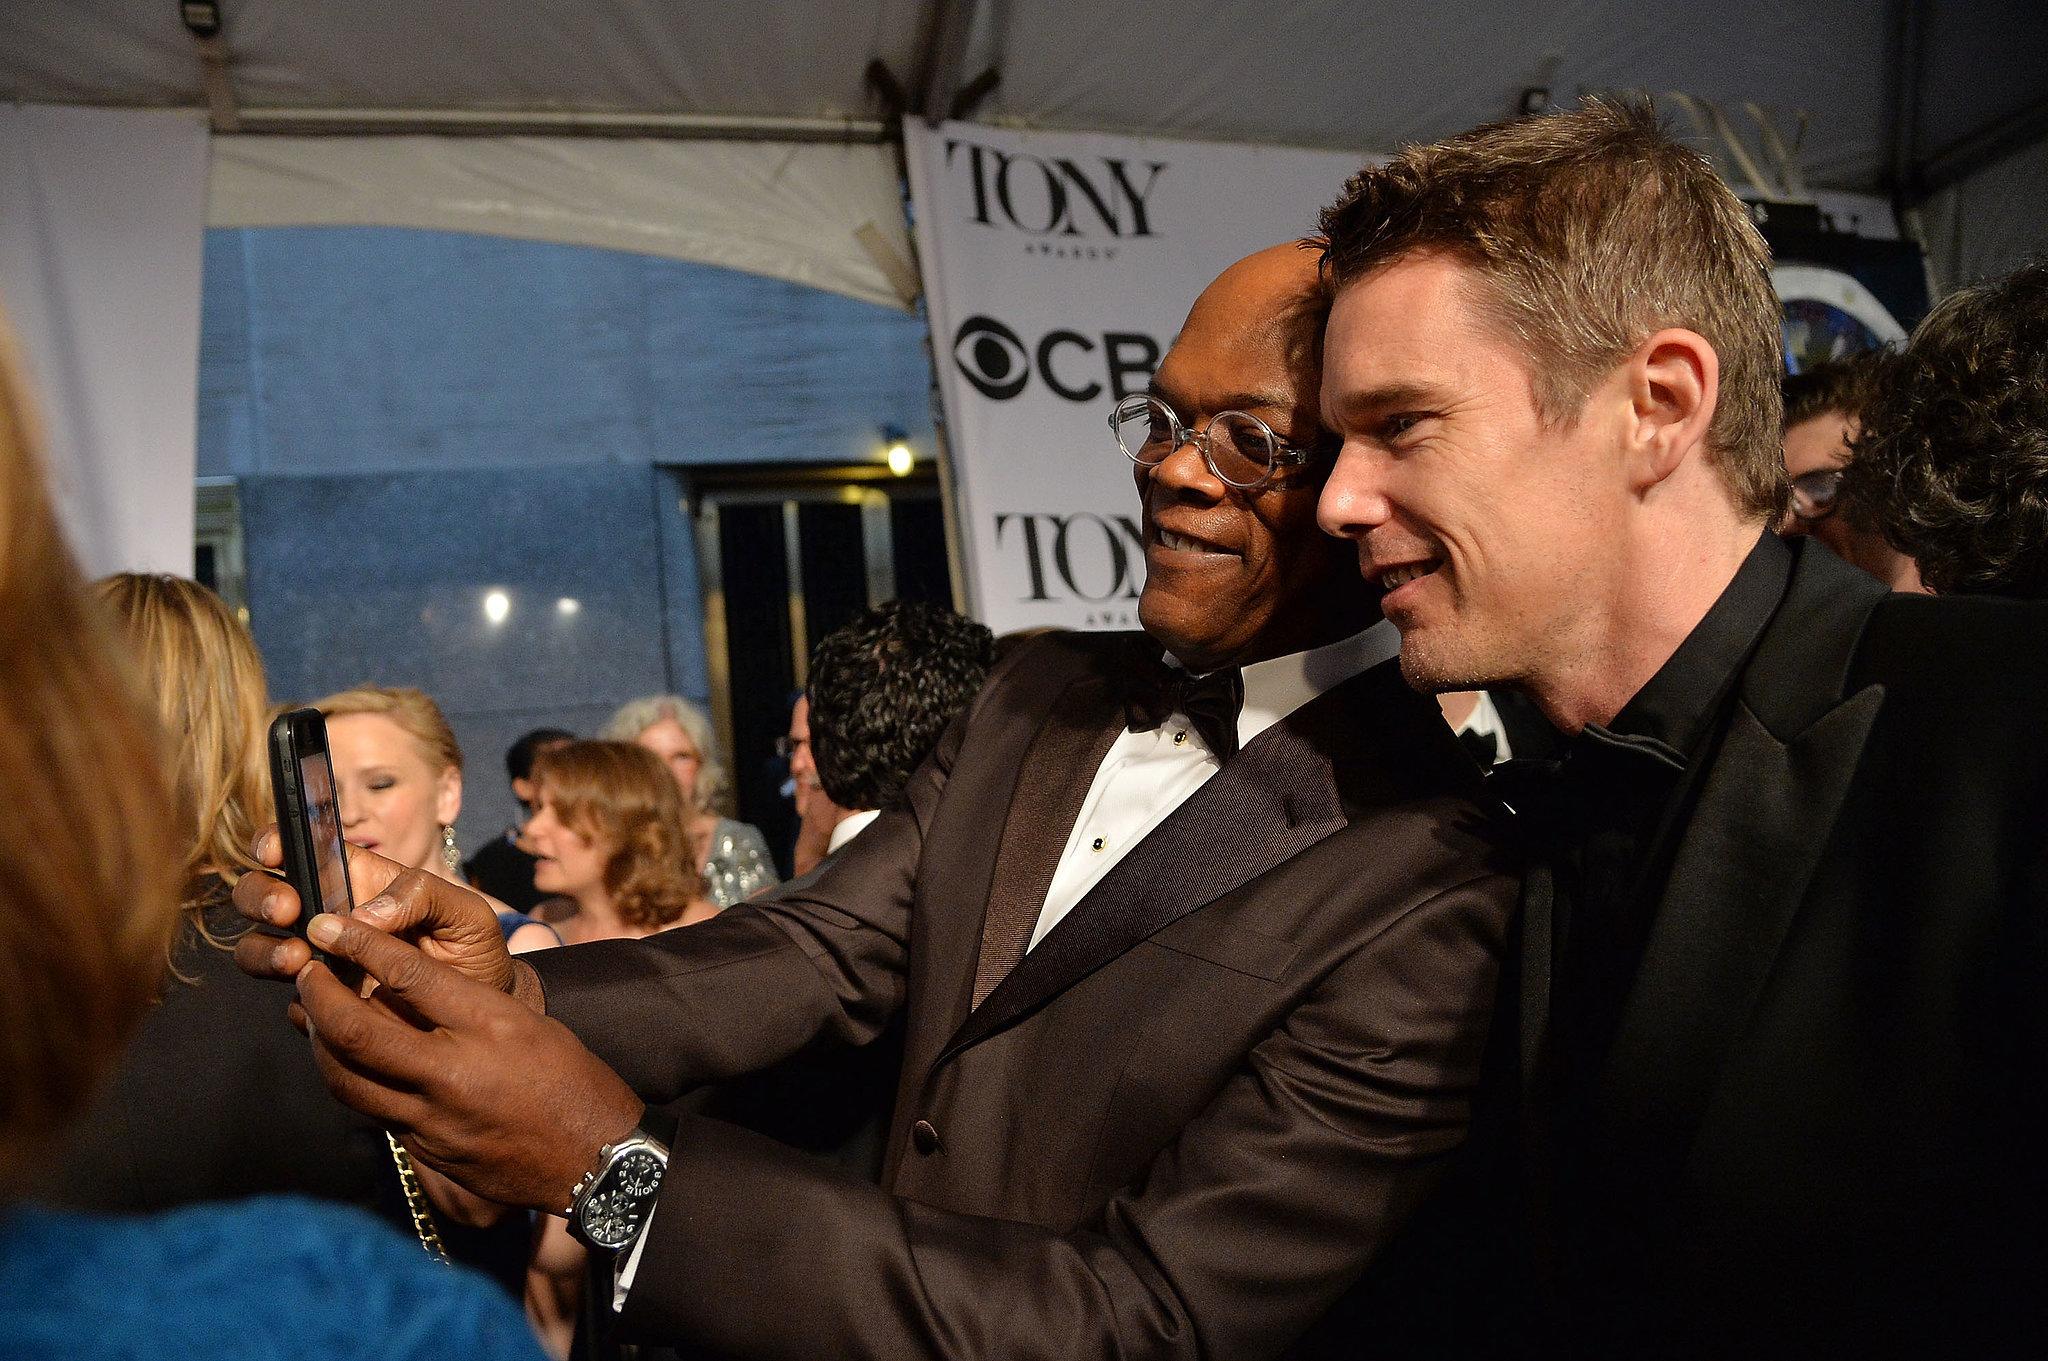 Samuel L. Jackson took a selfie with Ethan Hawke.